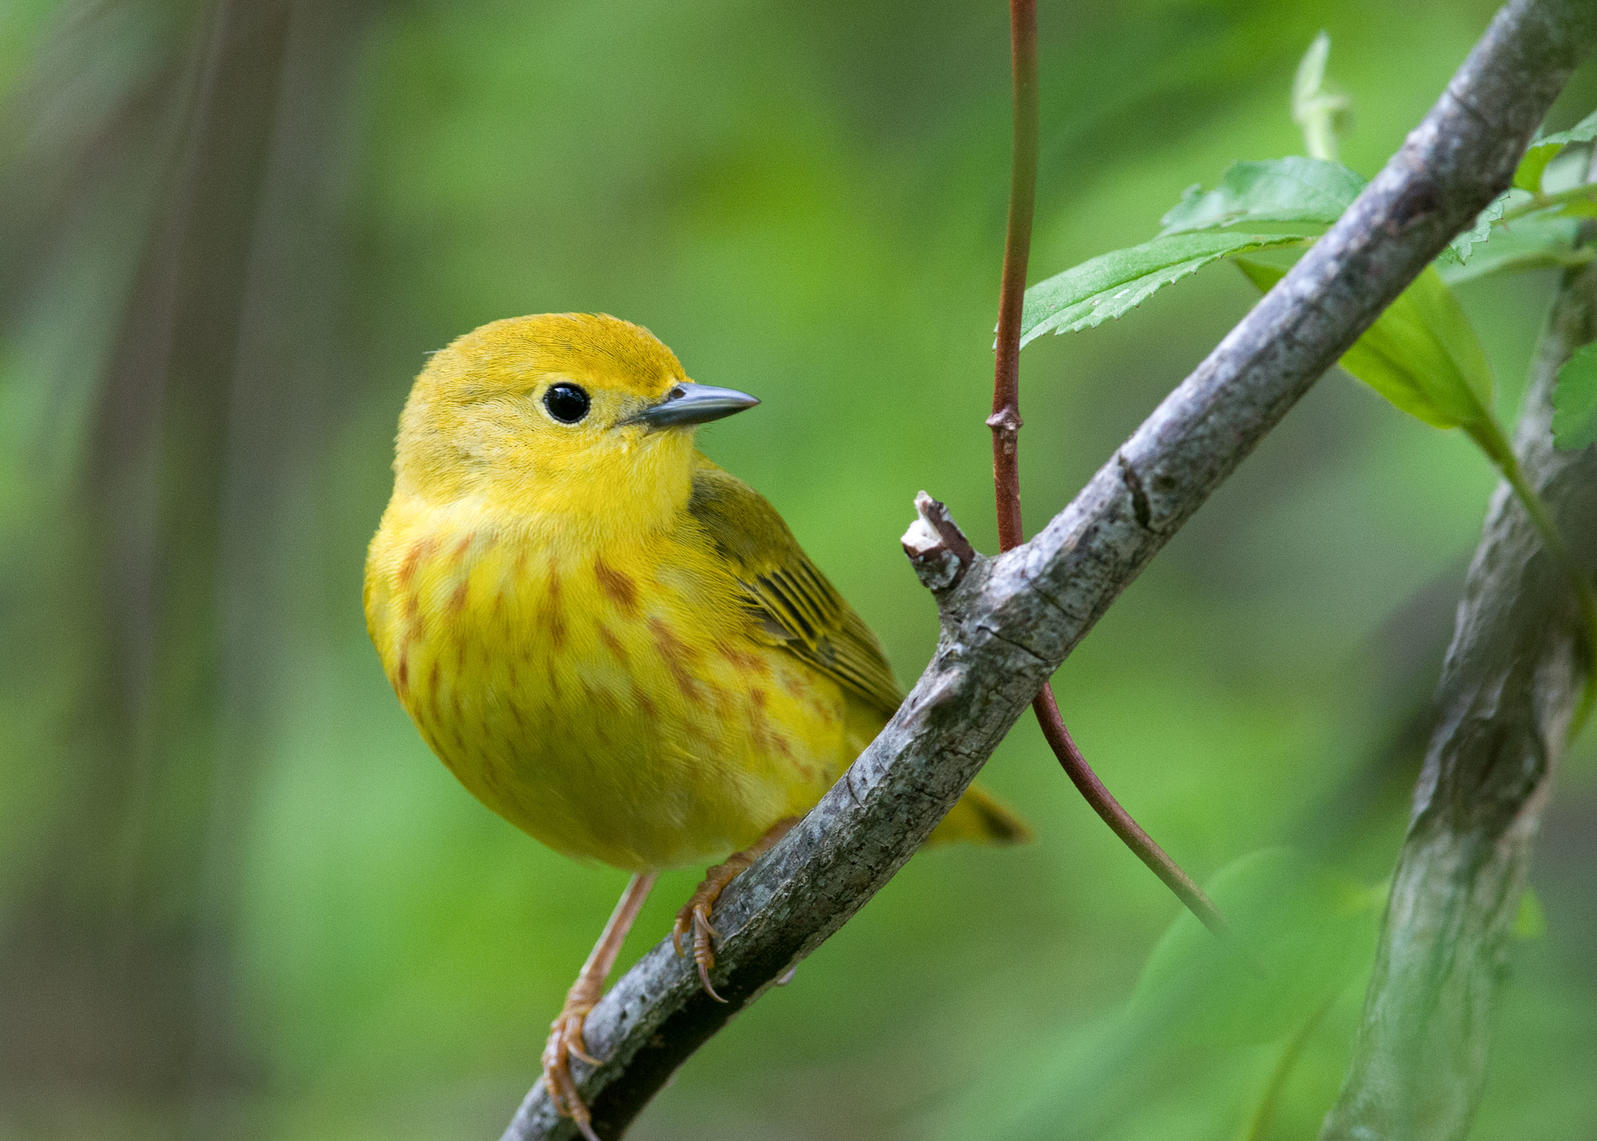 Yellow Warbler. Brian Collier/Audubon Photography Awards